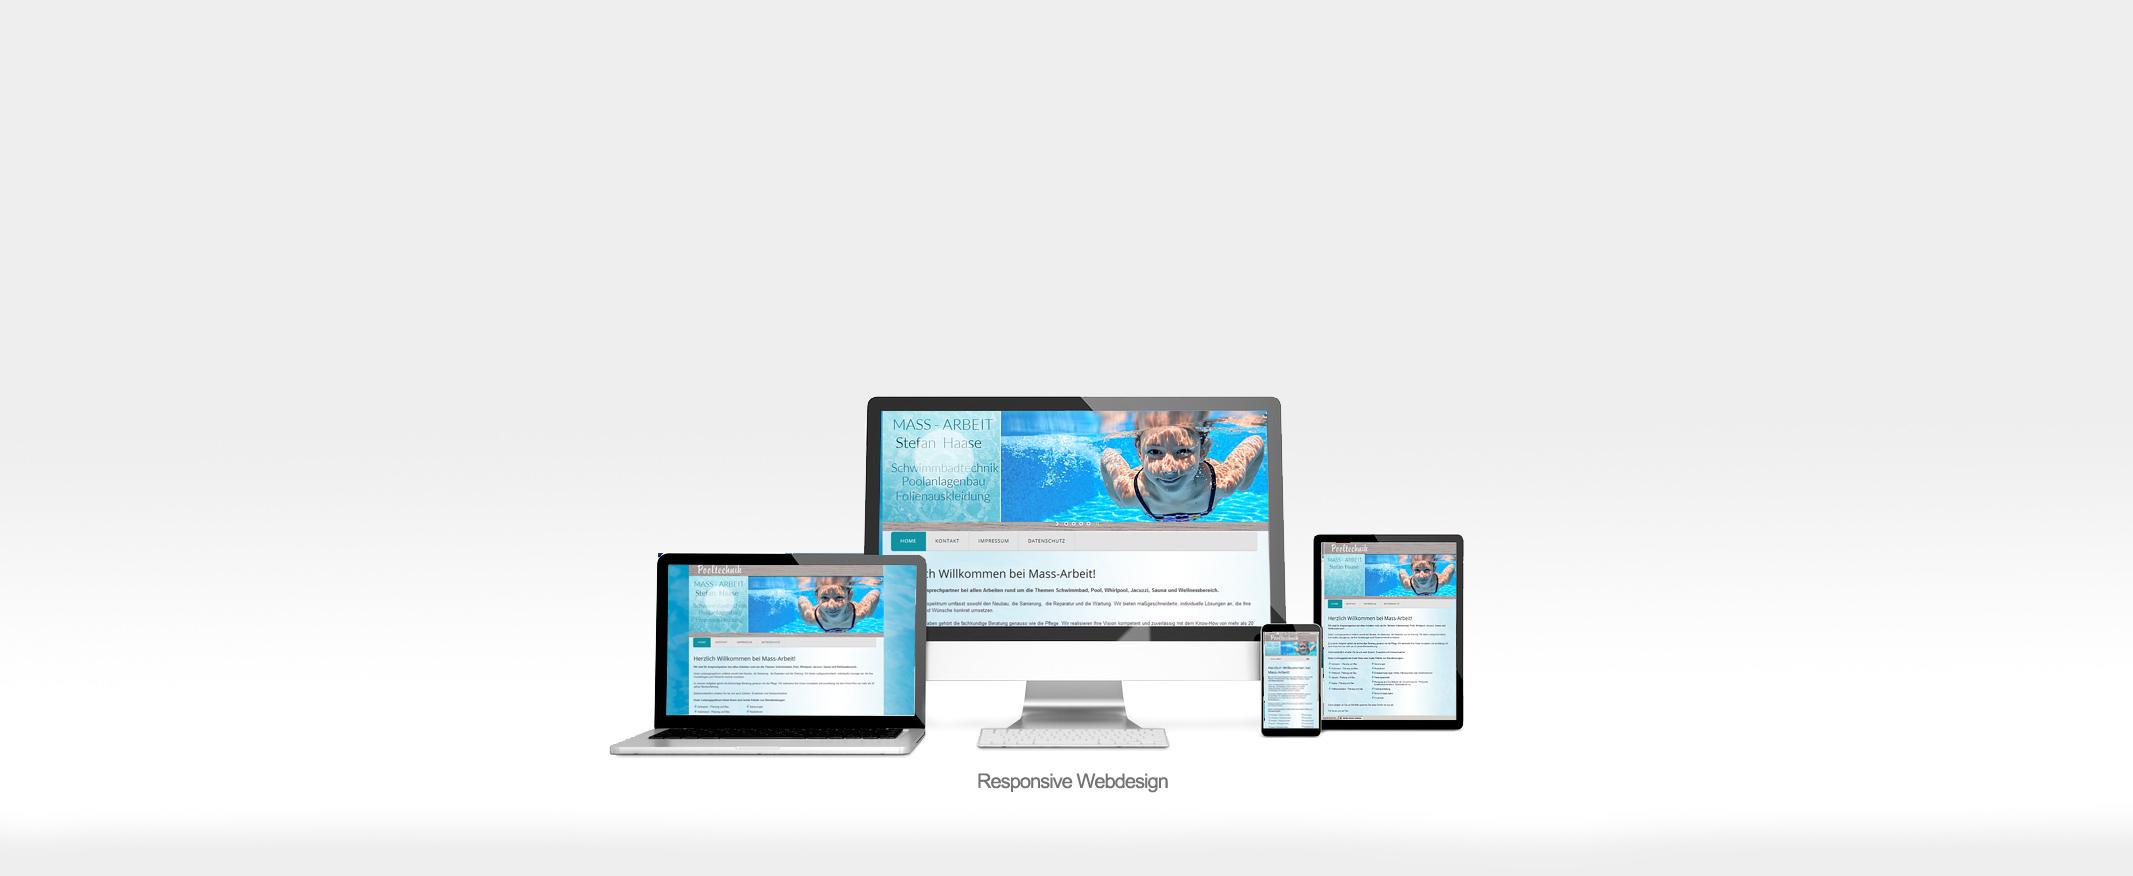 Webdesign Webseiten Erstellung in Reinfeld